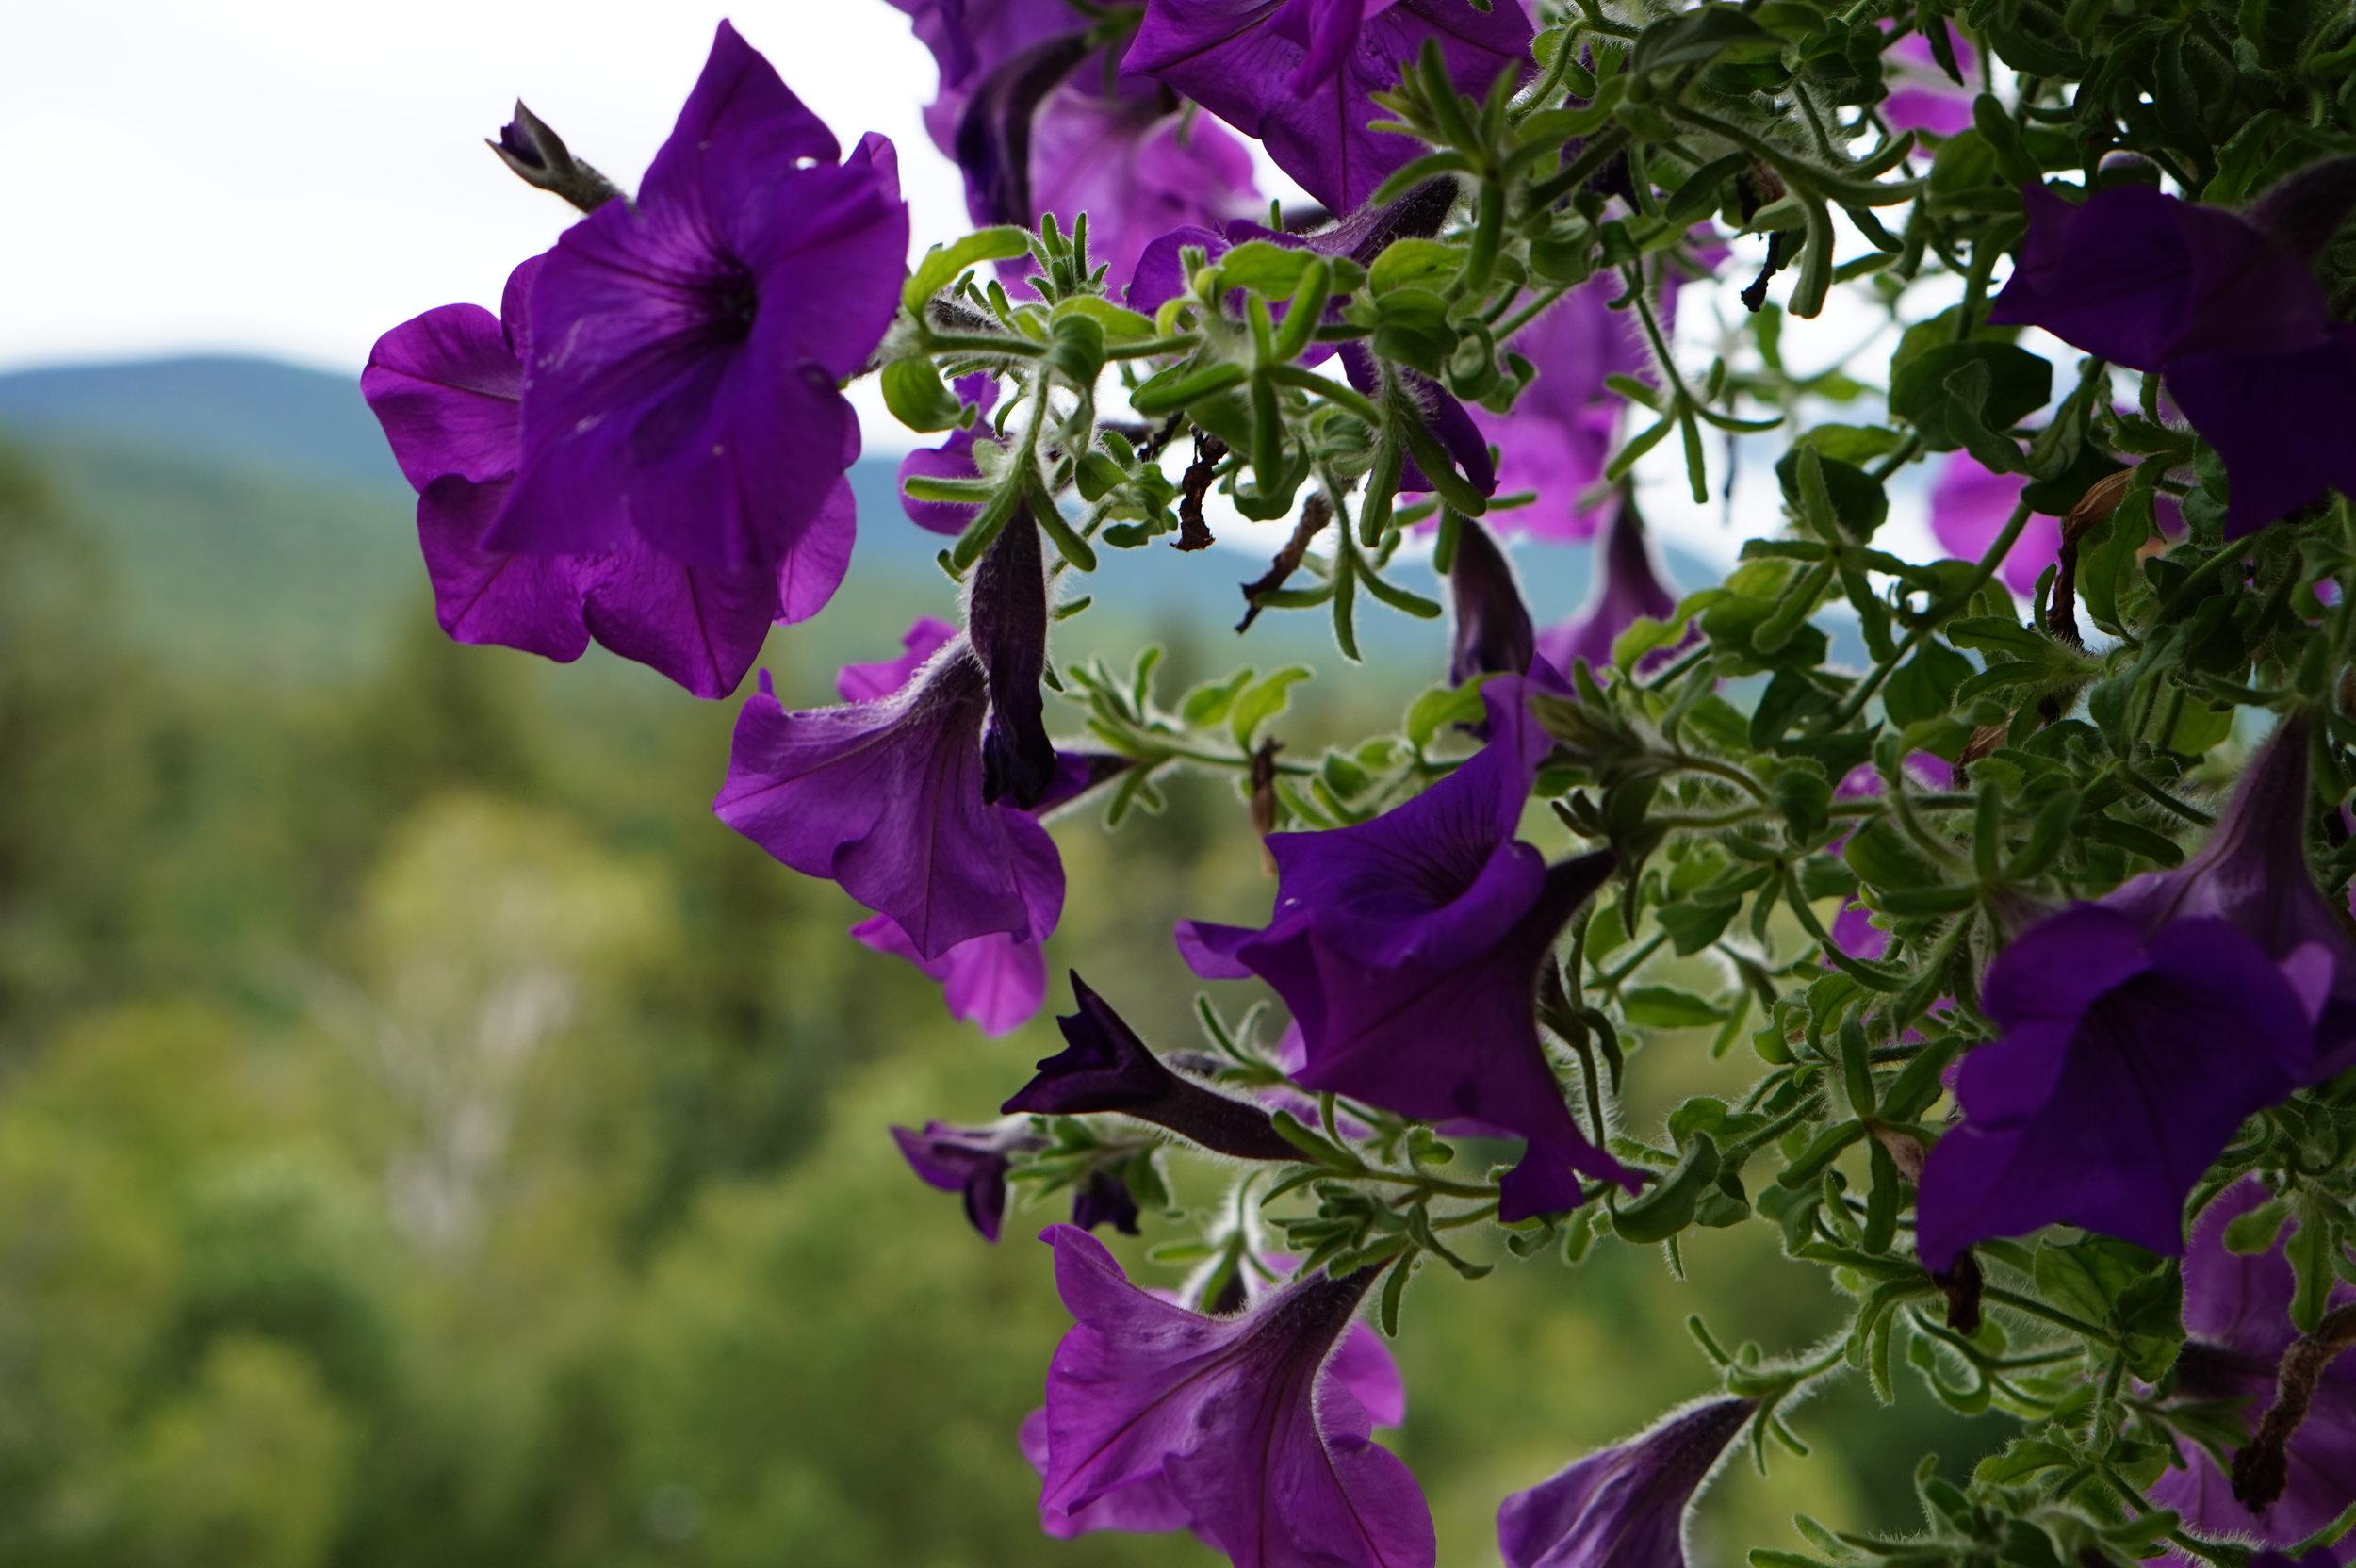 Hanging pot of petunias on the veranda.